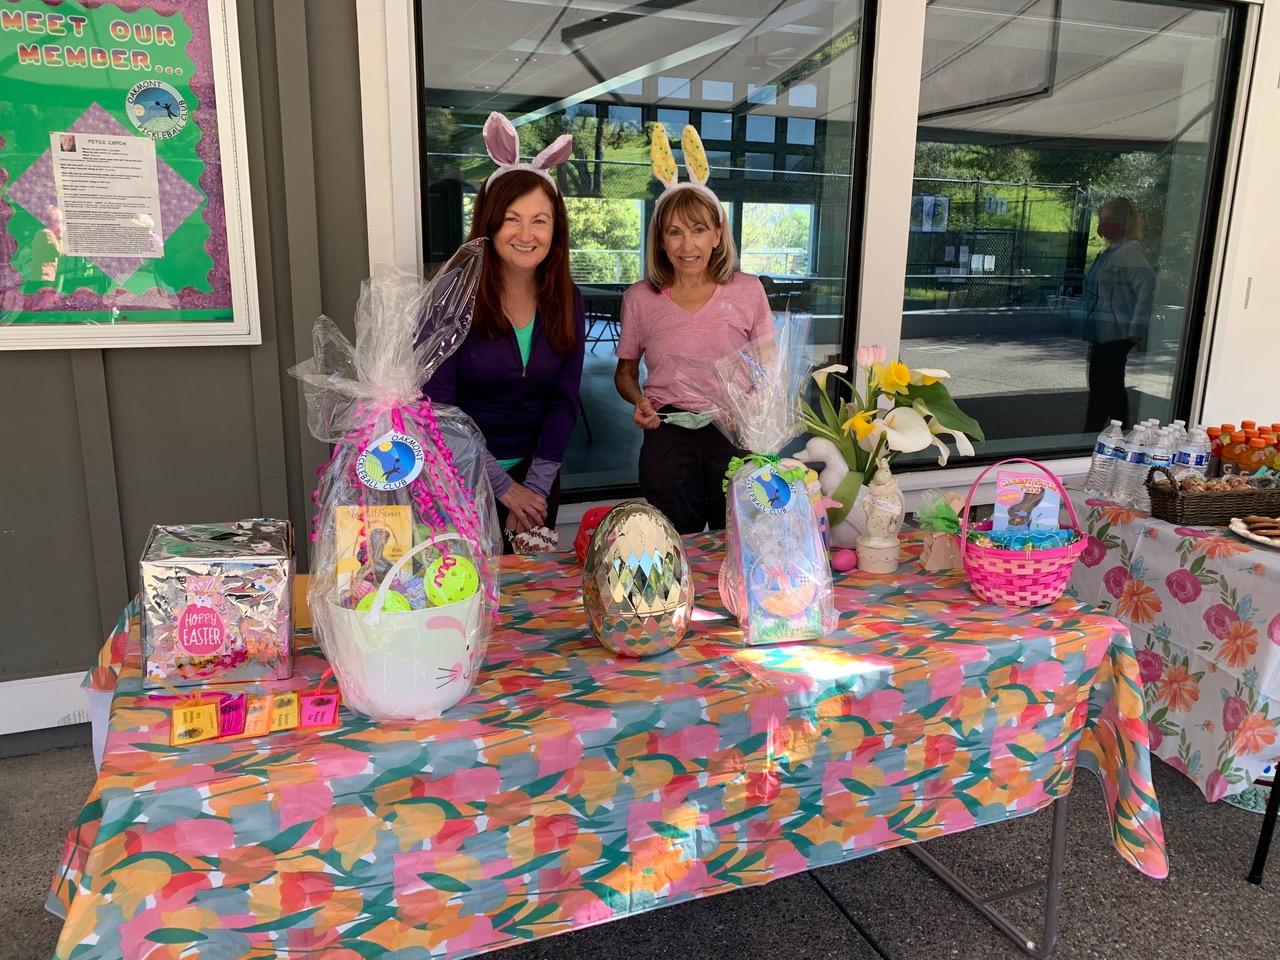 Credit: Photo by Helen Selenati Social committee volunteer Liz Majkowski and Carol Palombino posing with the Easter raffle prizes.